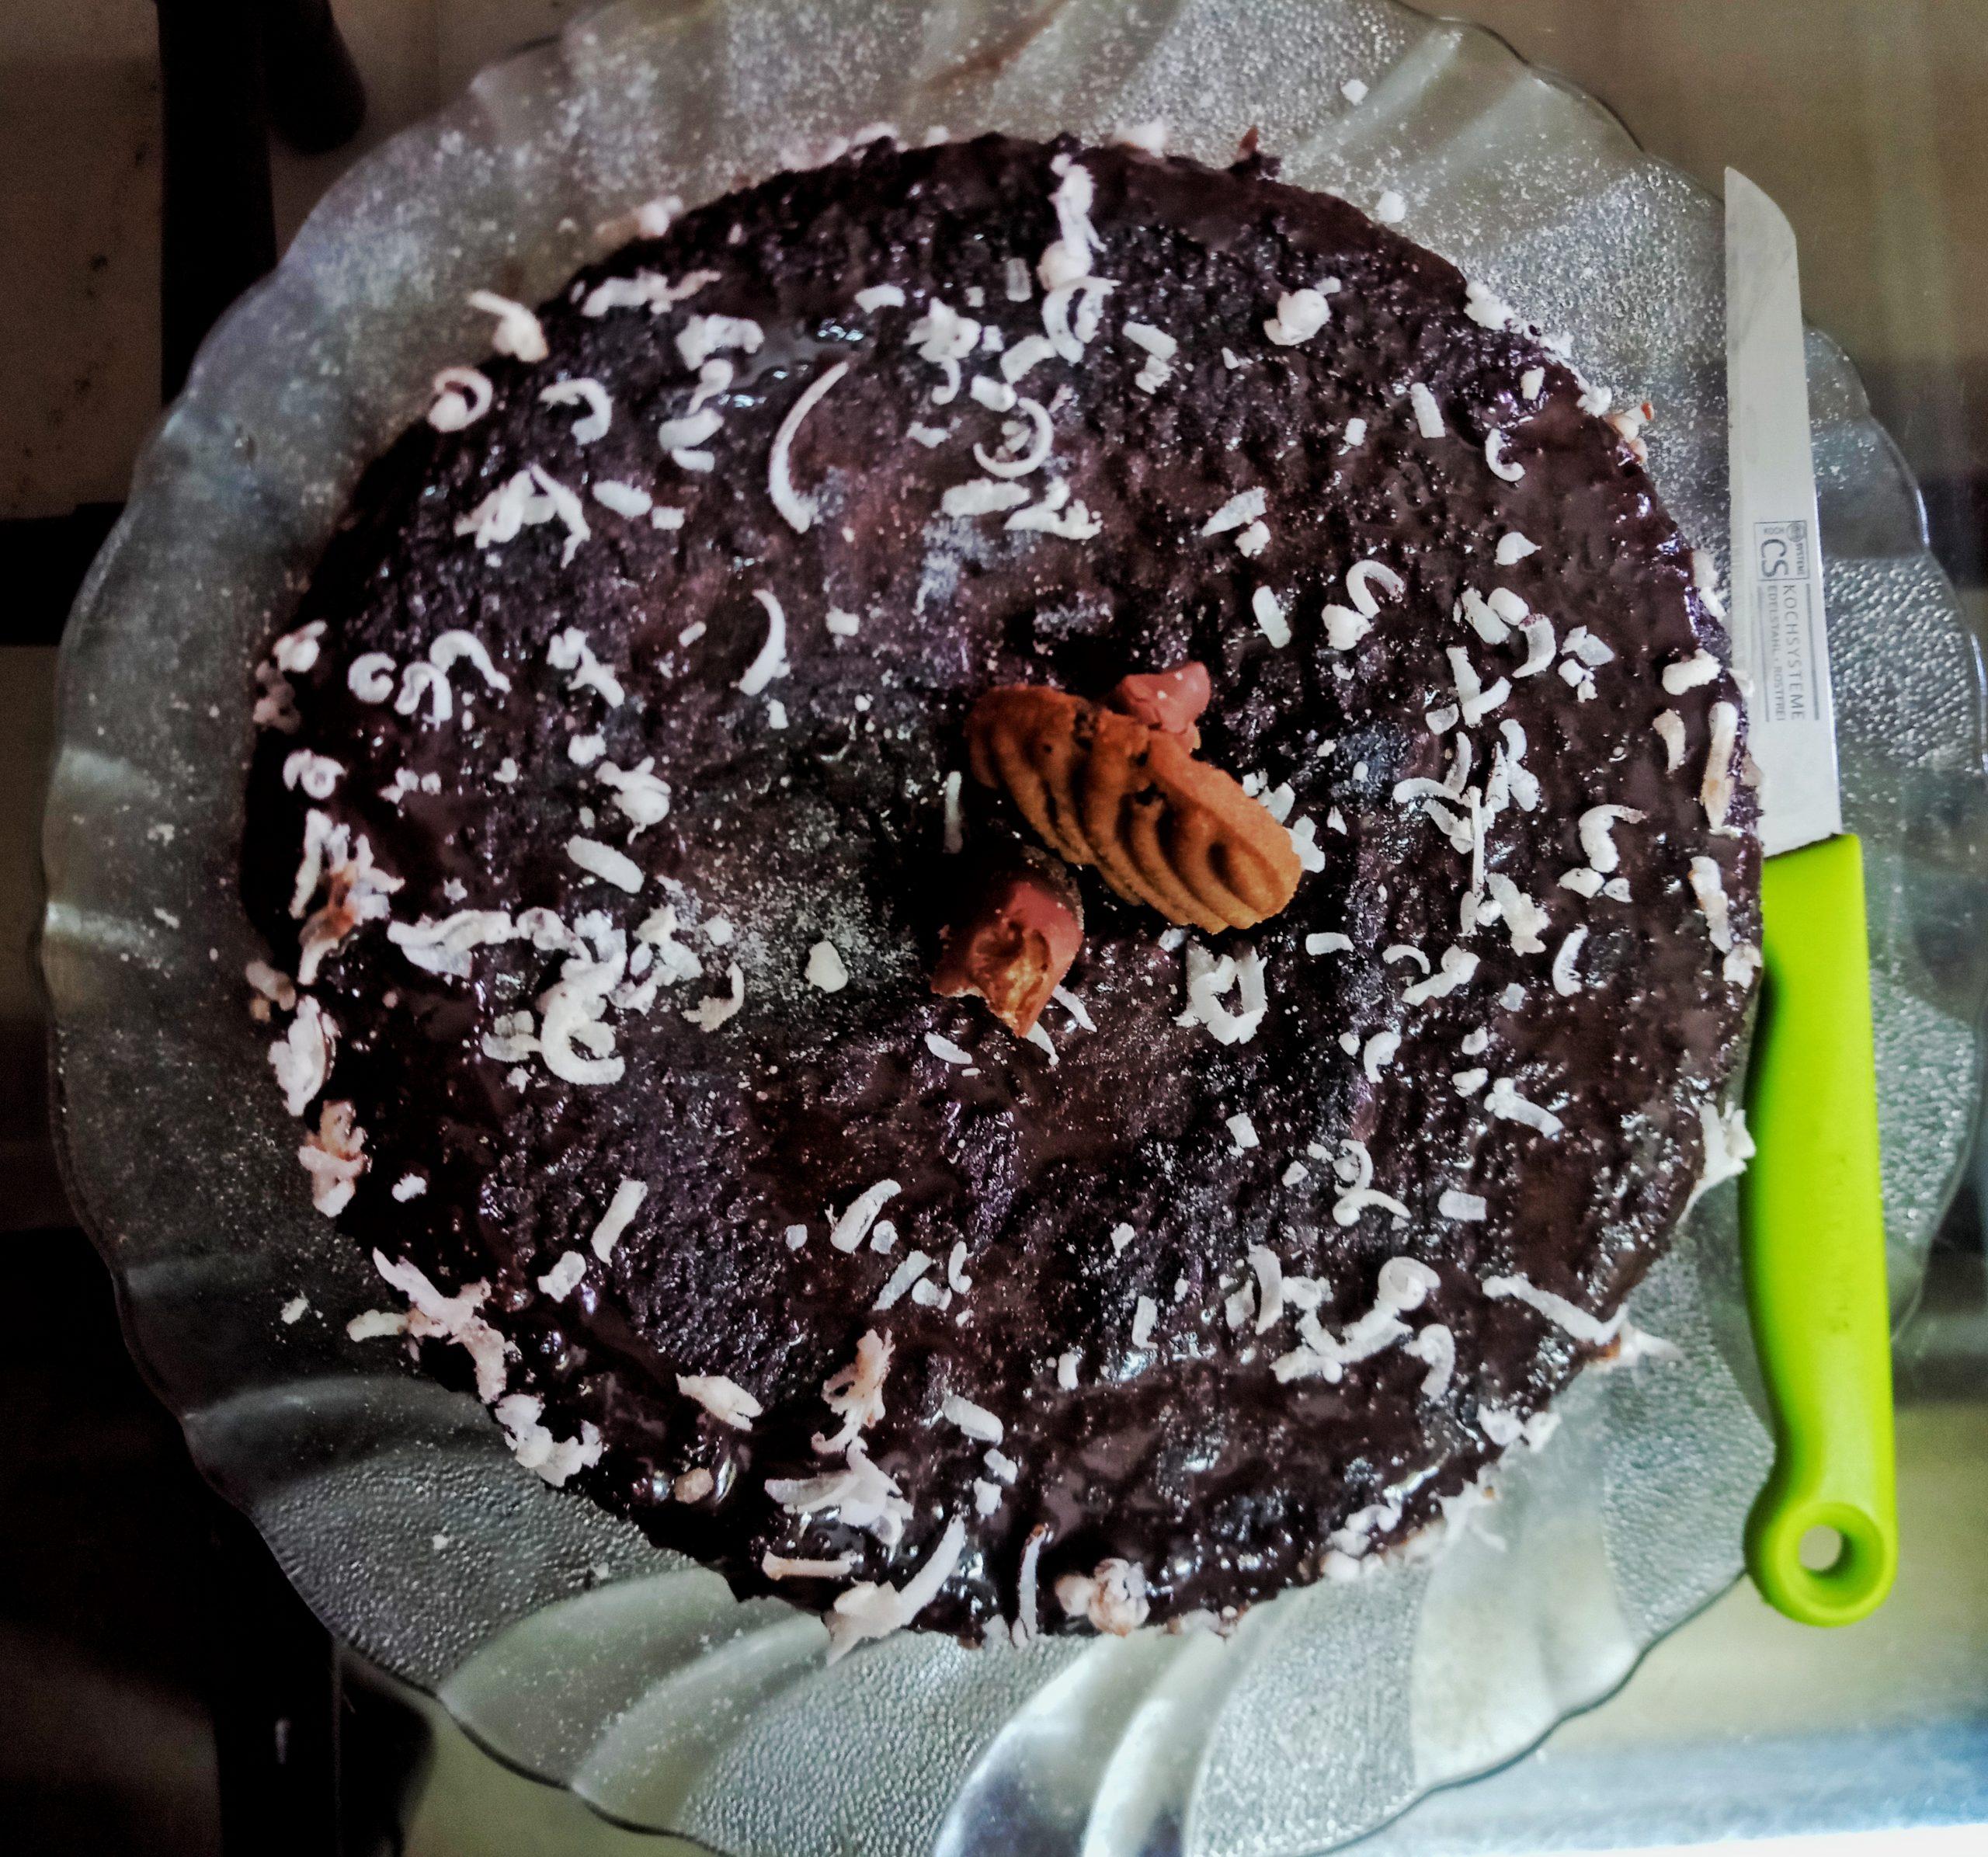 Home-made Chocolate Cake